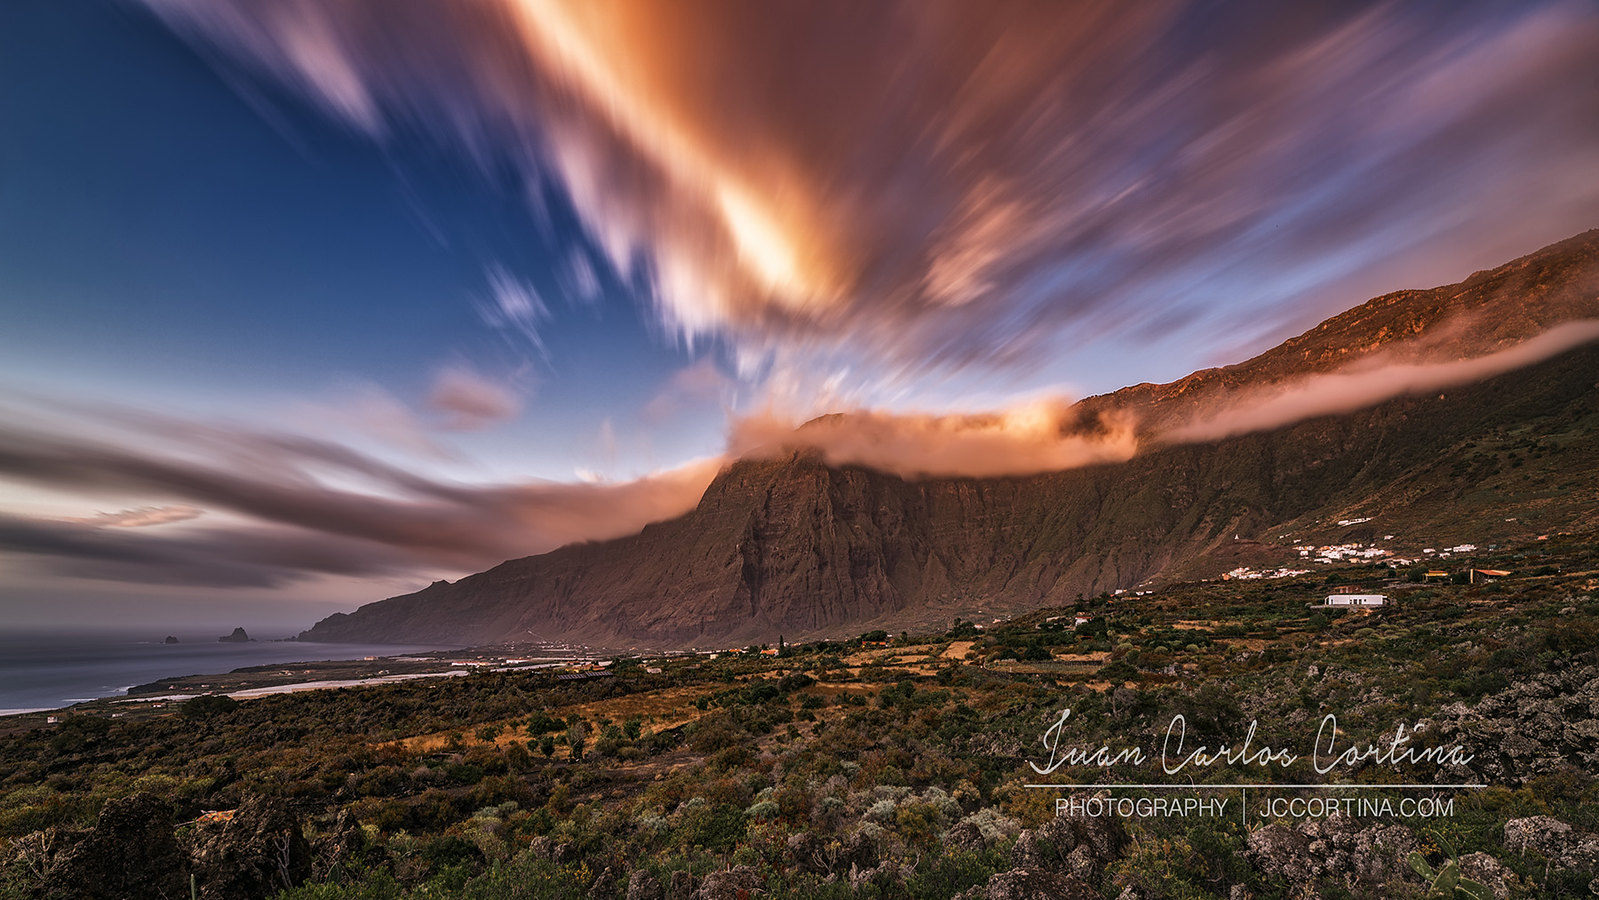 TIMELAPSE EL HIERRO, THE LAST ISLAND